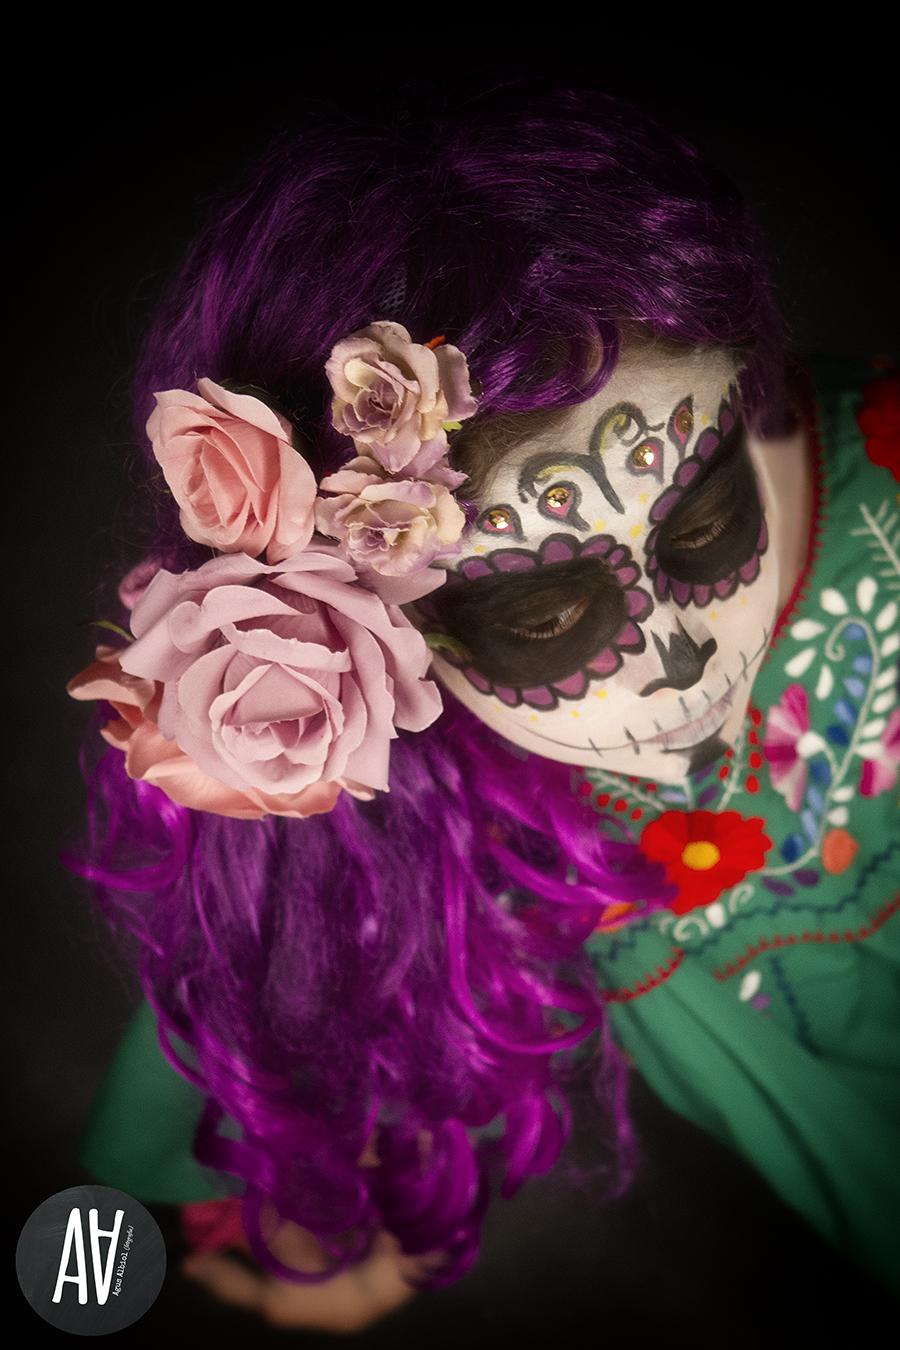 Sesiones de estudio maquillaje sesiones espciales agusalbiol fotografia locuras de agus albiol fotografia bfotografa barcelona tona.9